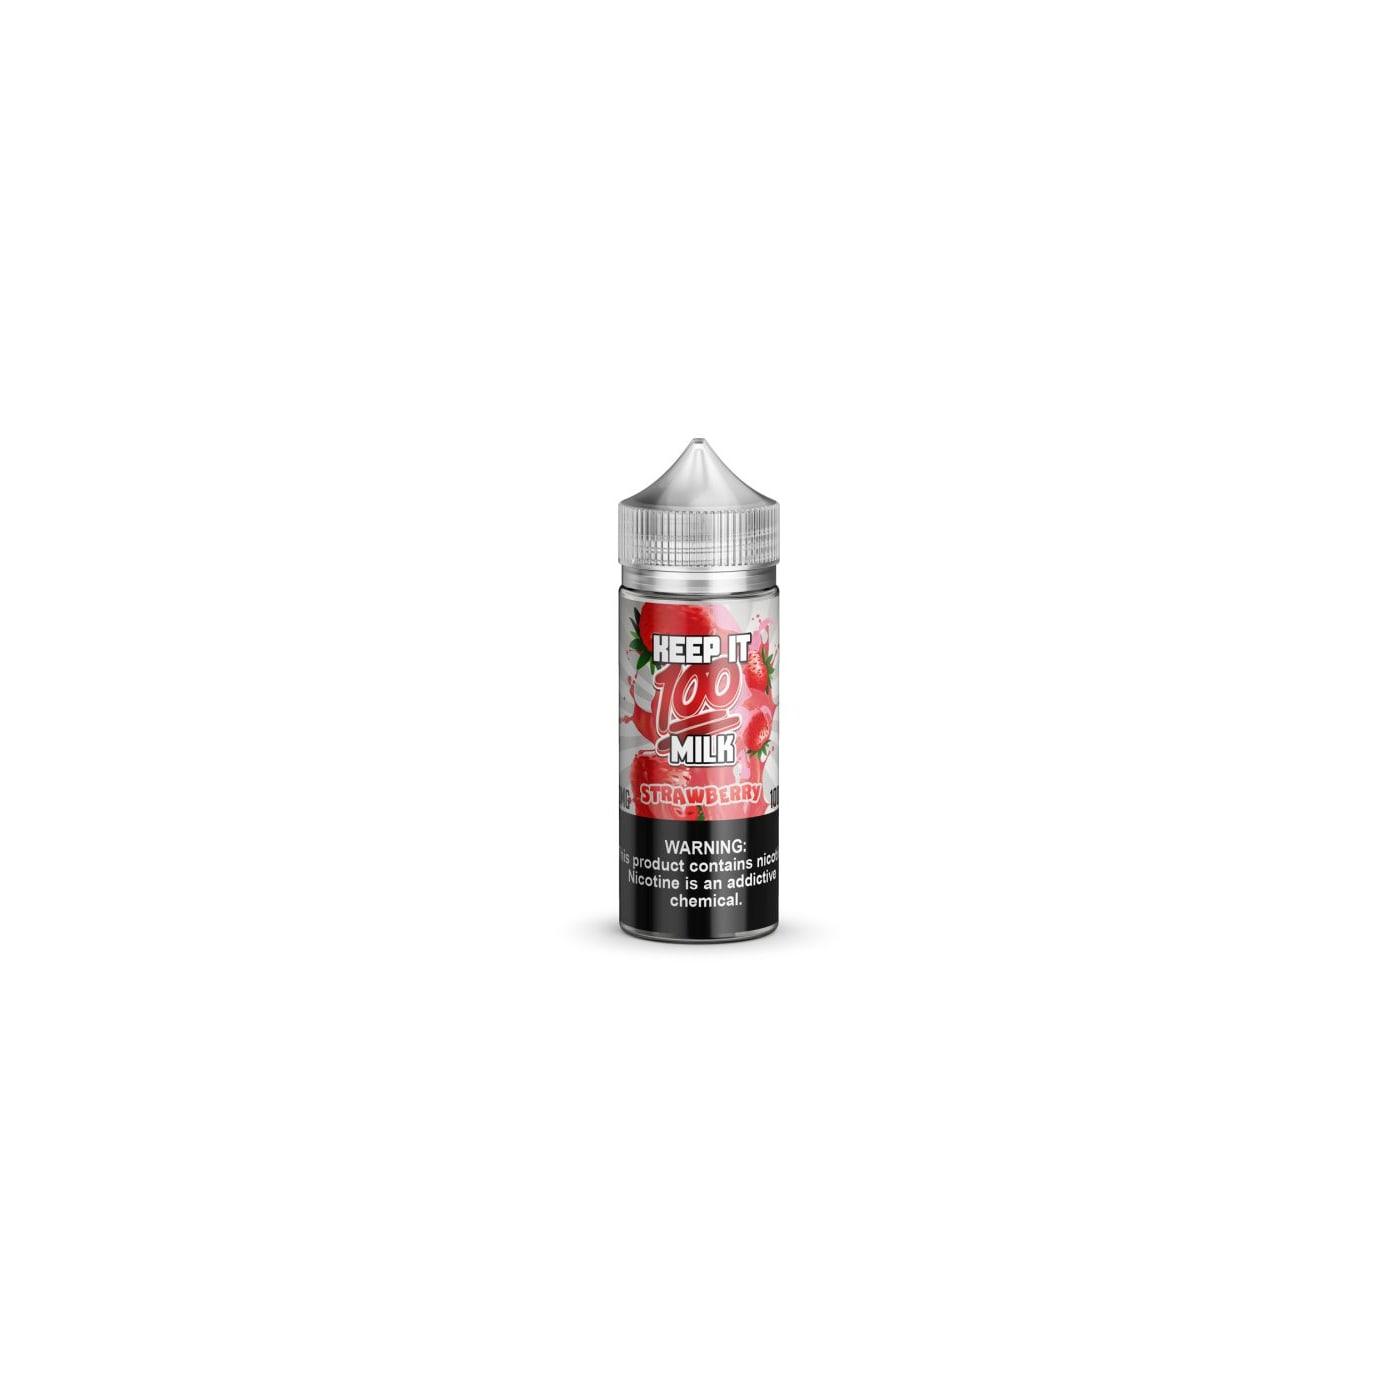 Keep It 100 Strawberry Milk E-Juice 100ml